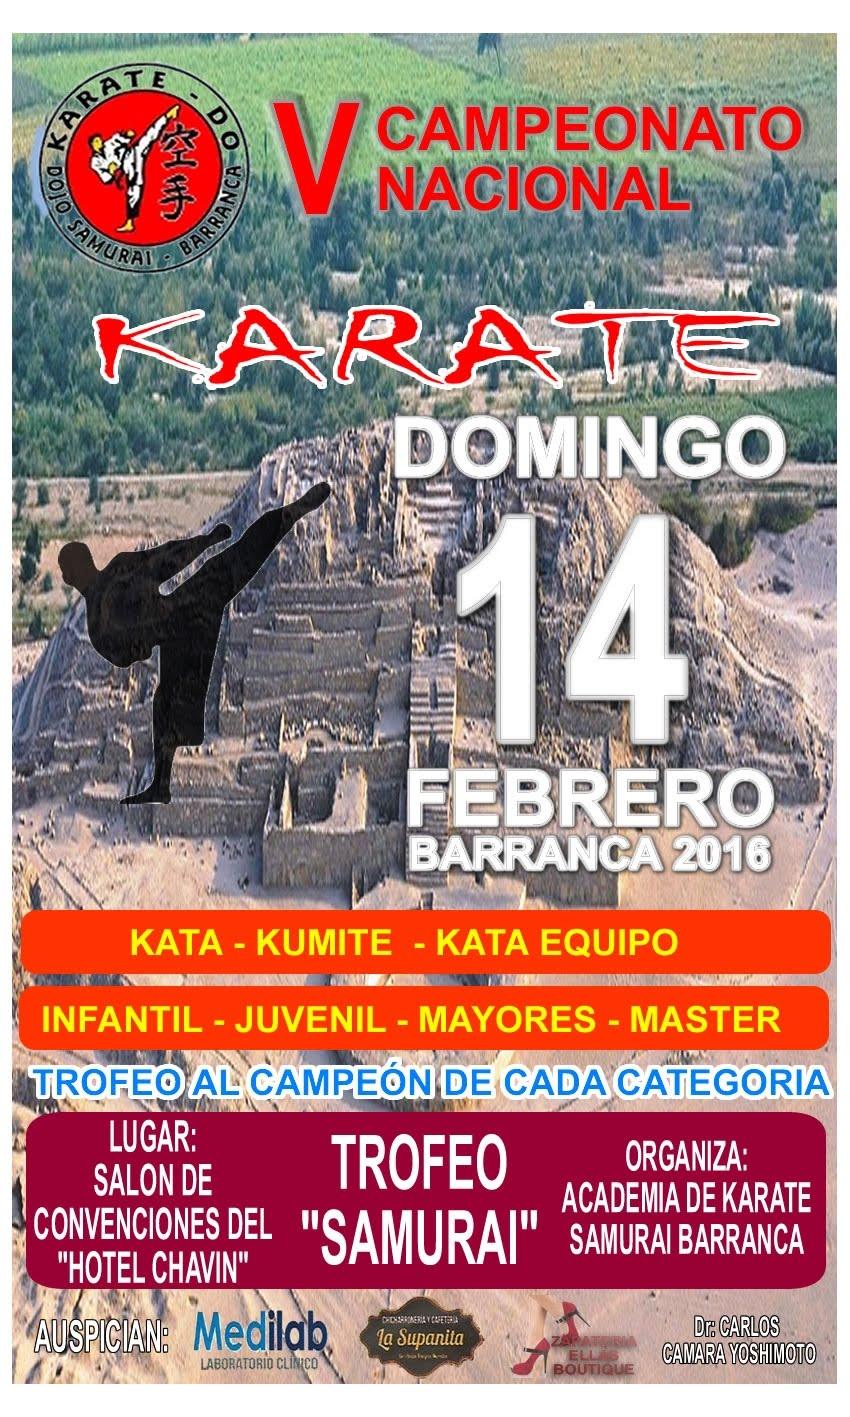 "V CAMPEONATO NACIONAL DE KARATE ""Trofeo Samurai"" Barranca-Perú"